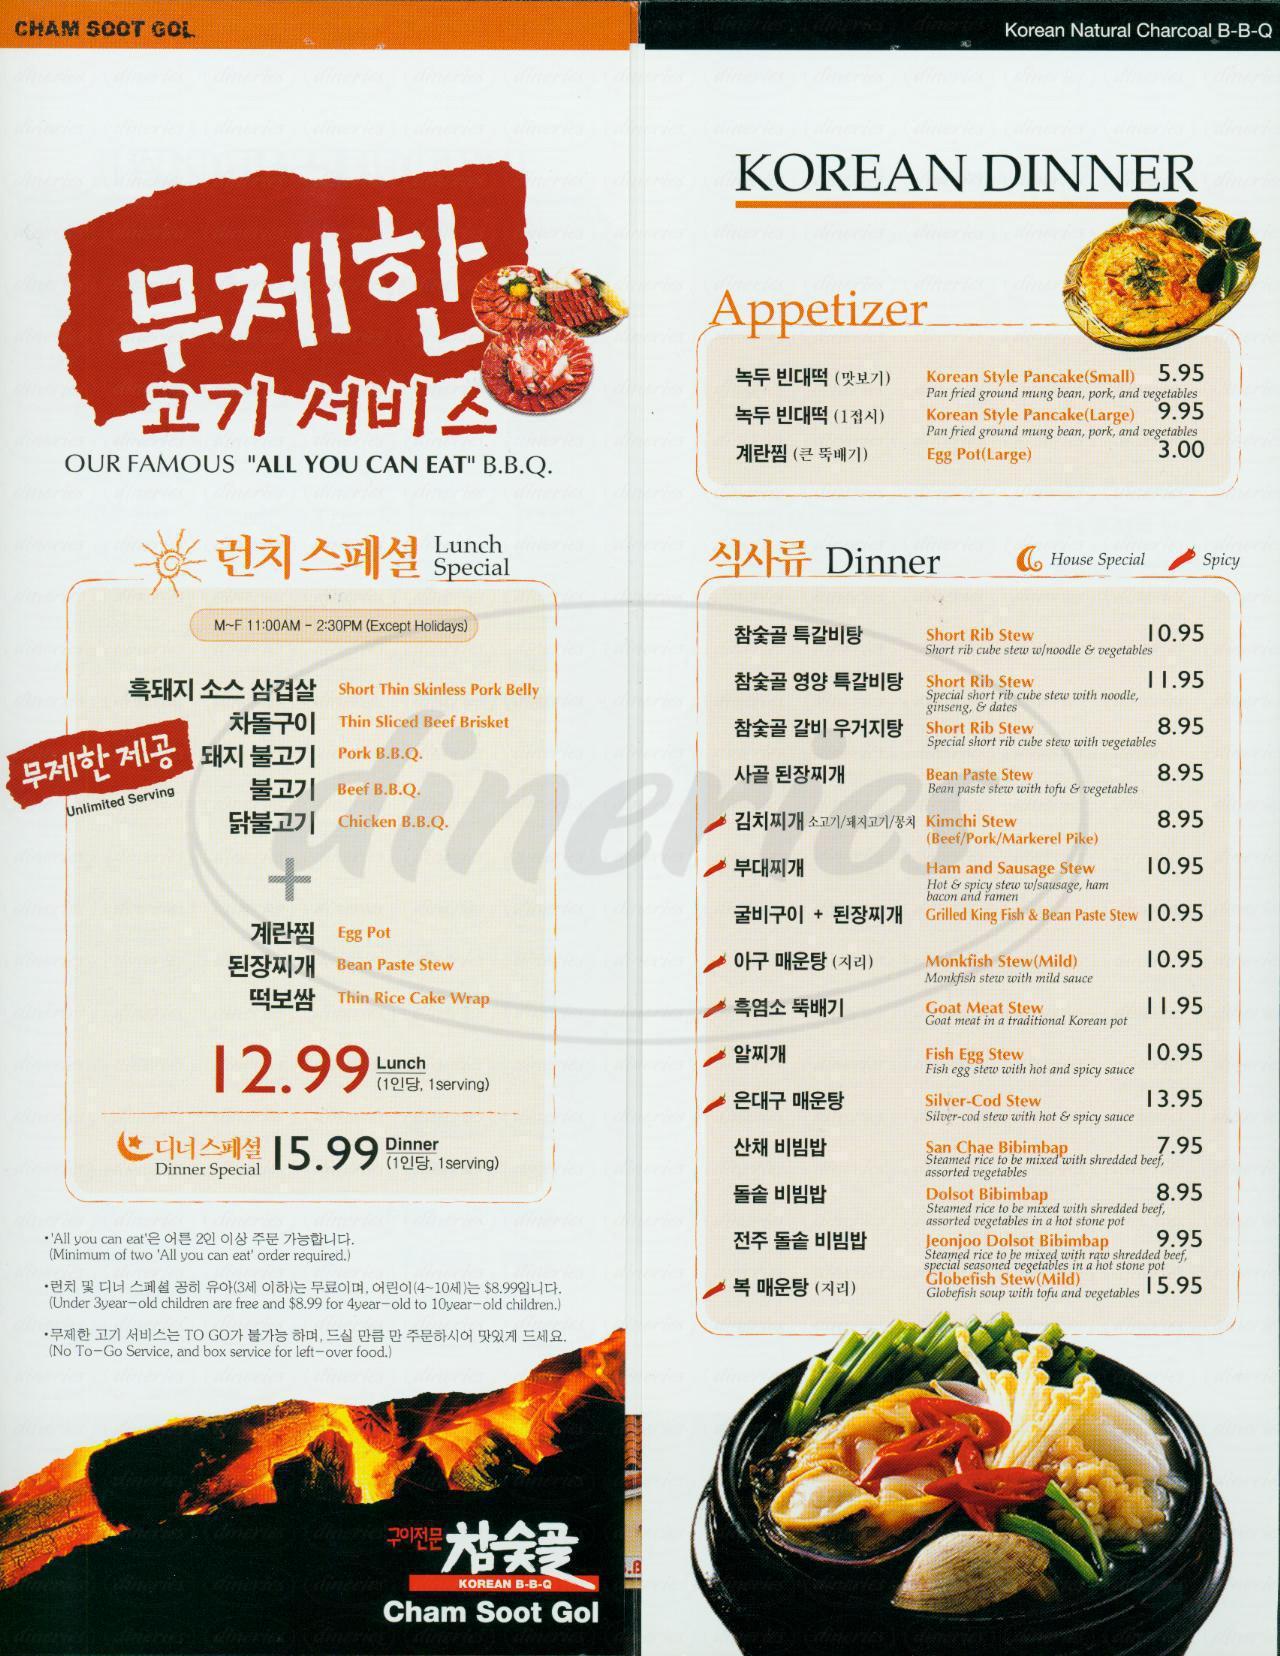 menu for Cham Soot Gol